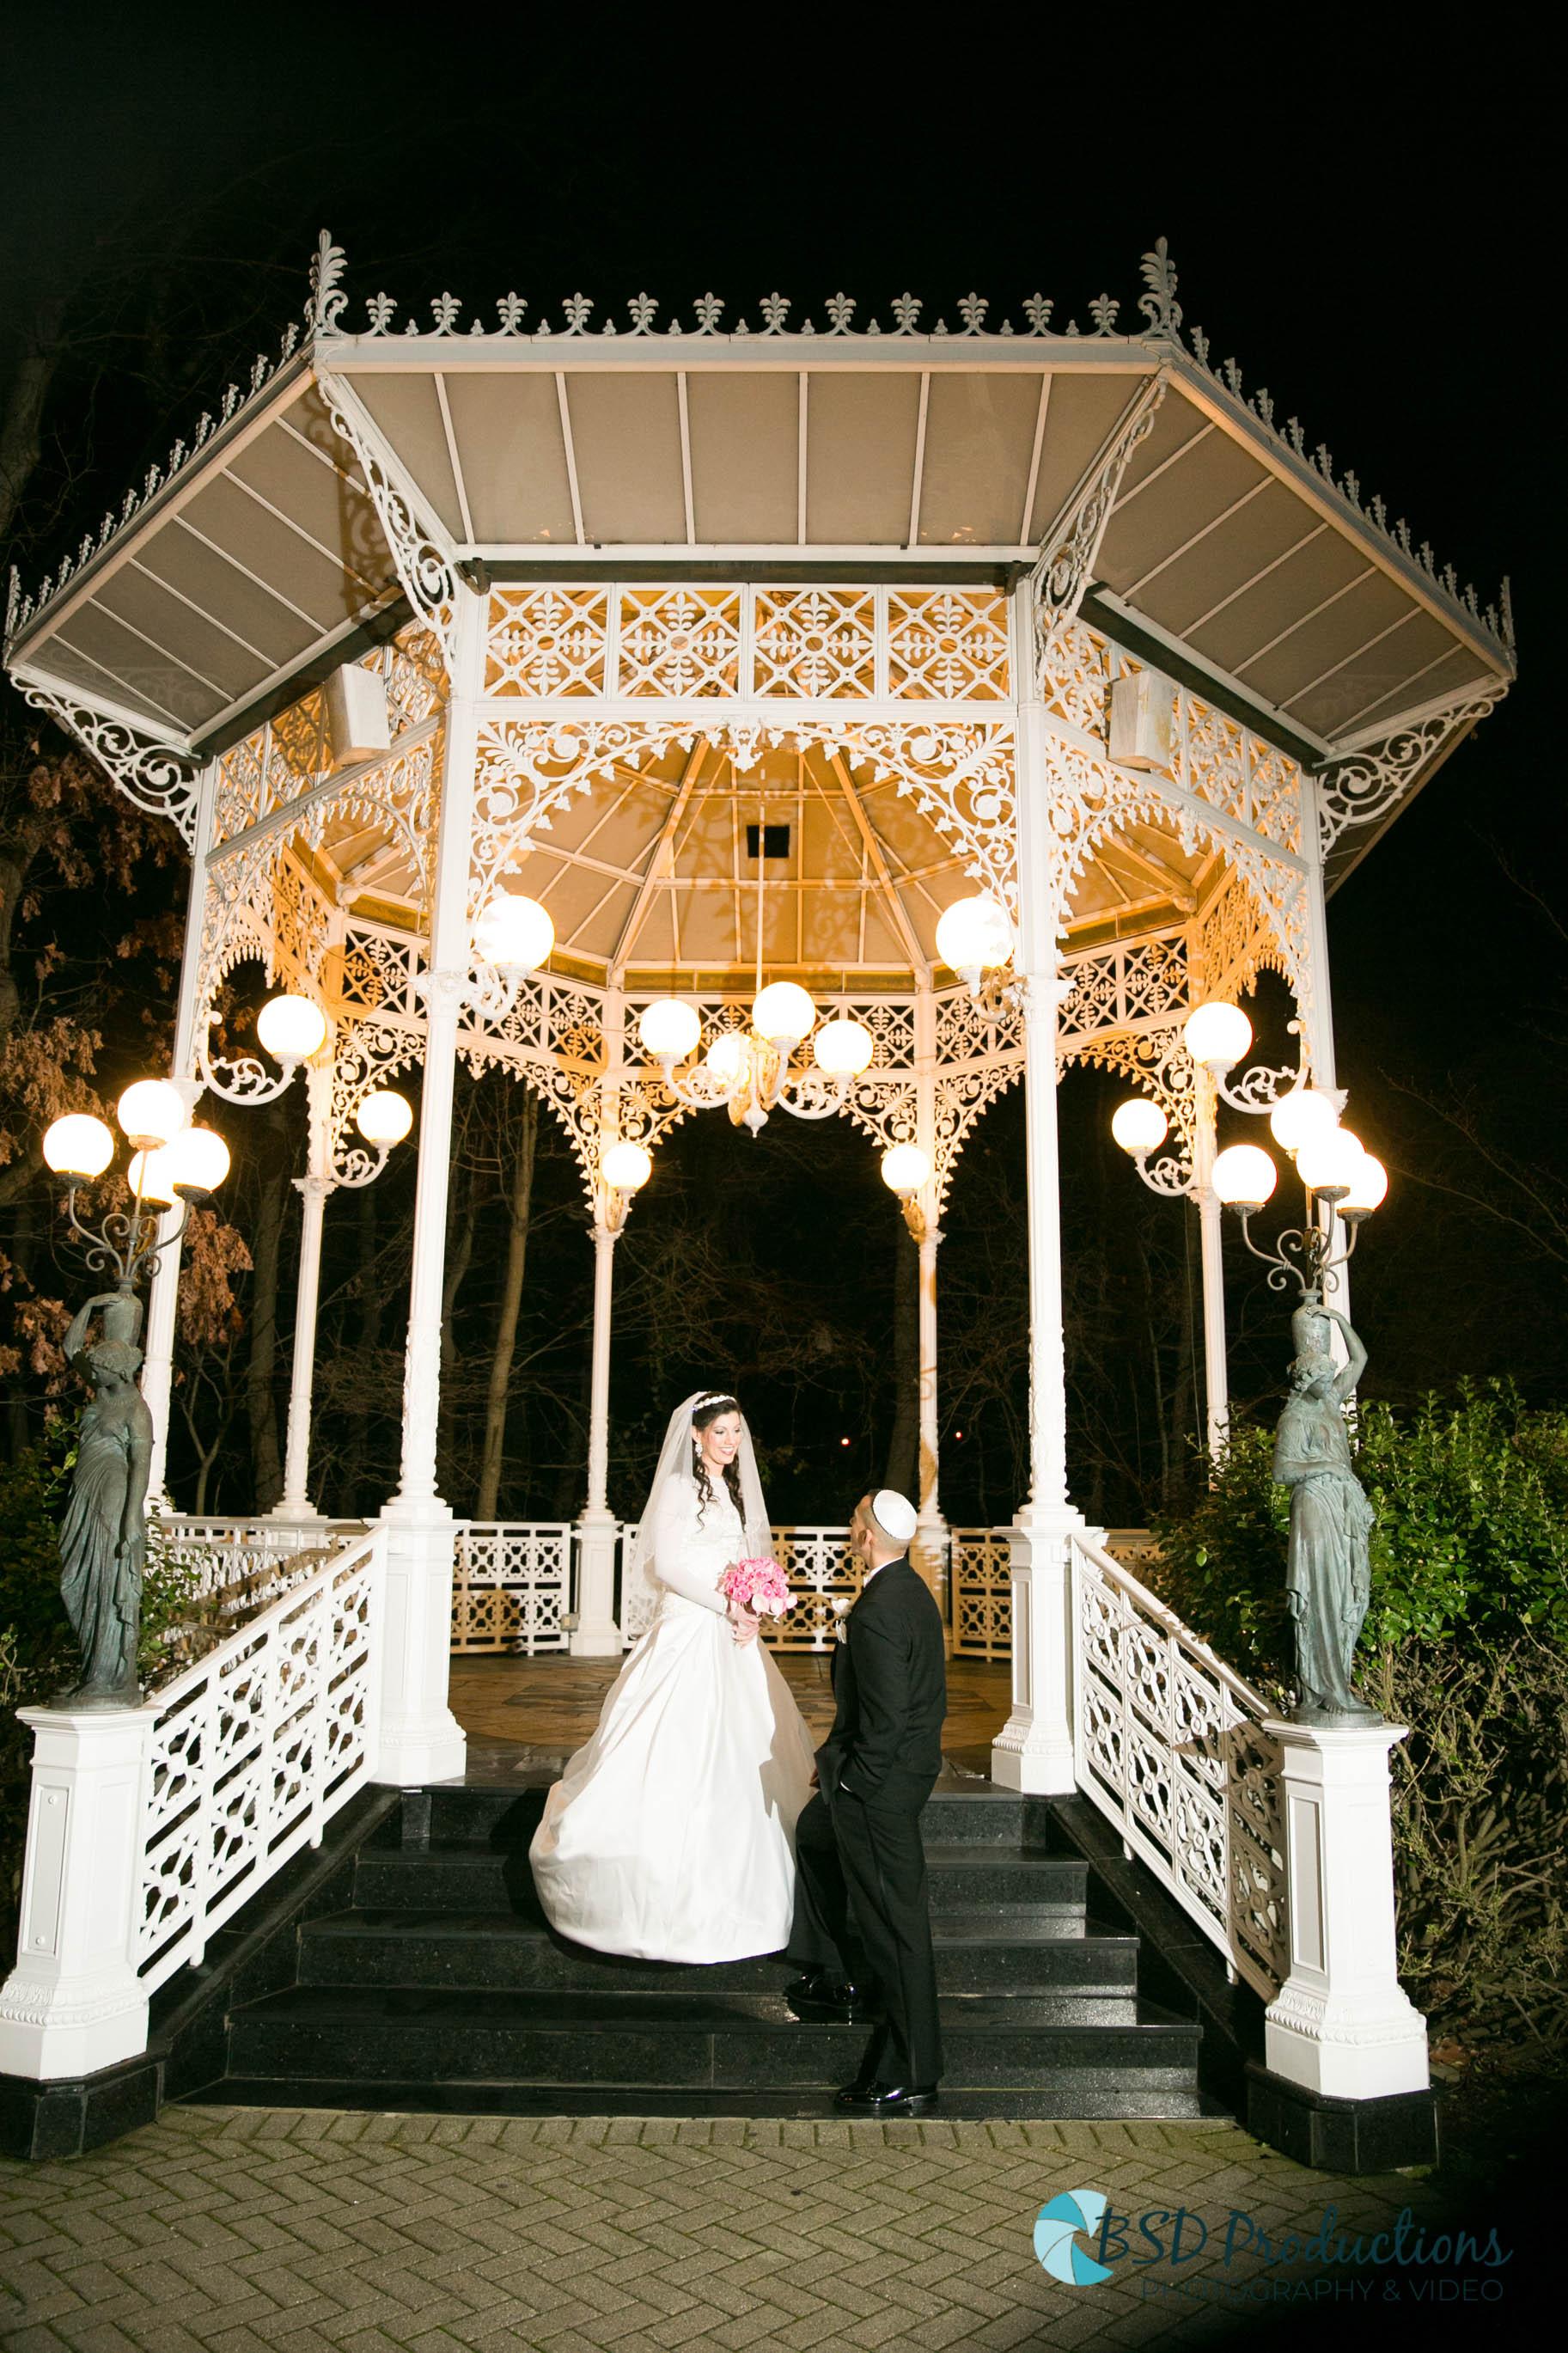 D_R_0063 Wedding – BSD Productions Photography